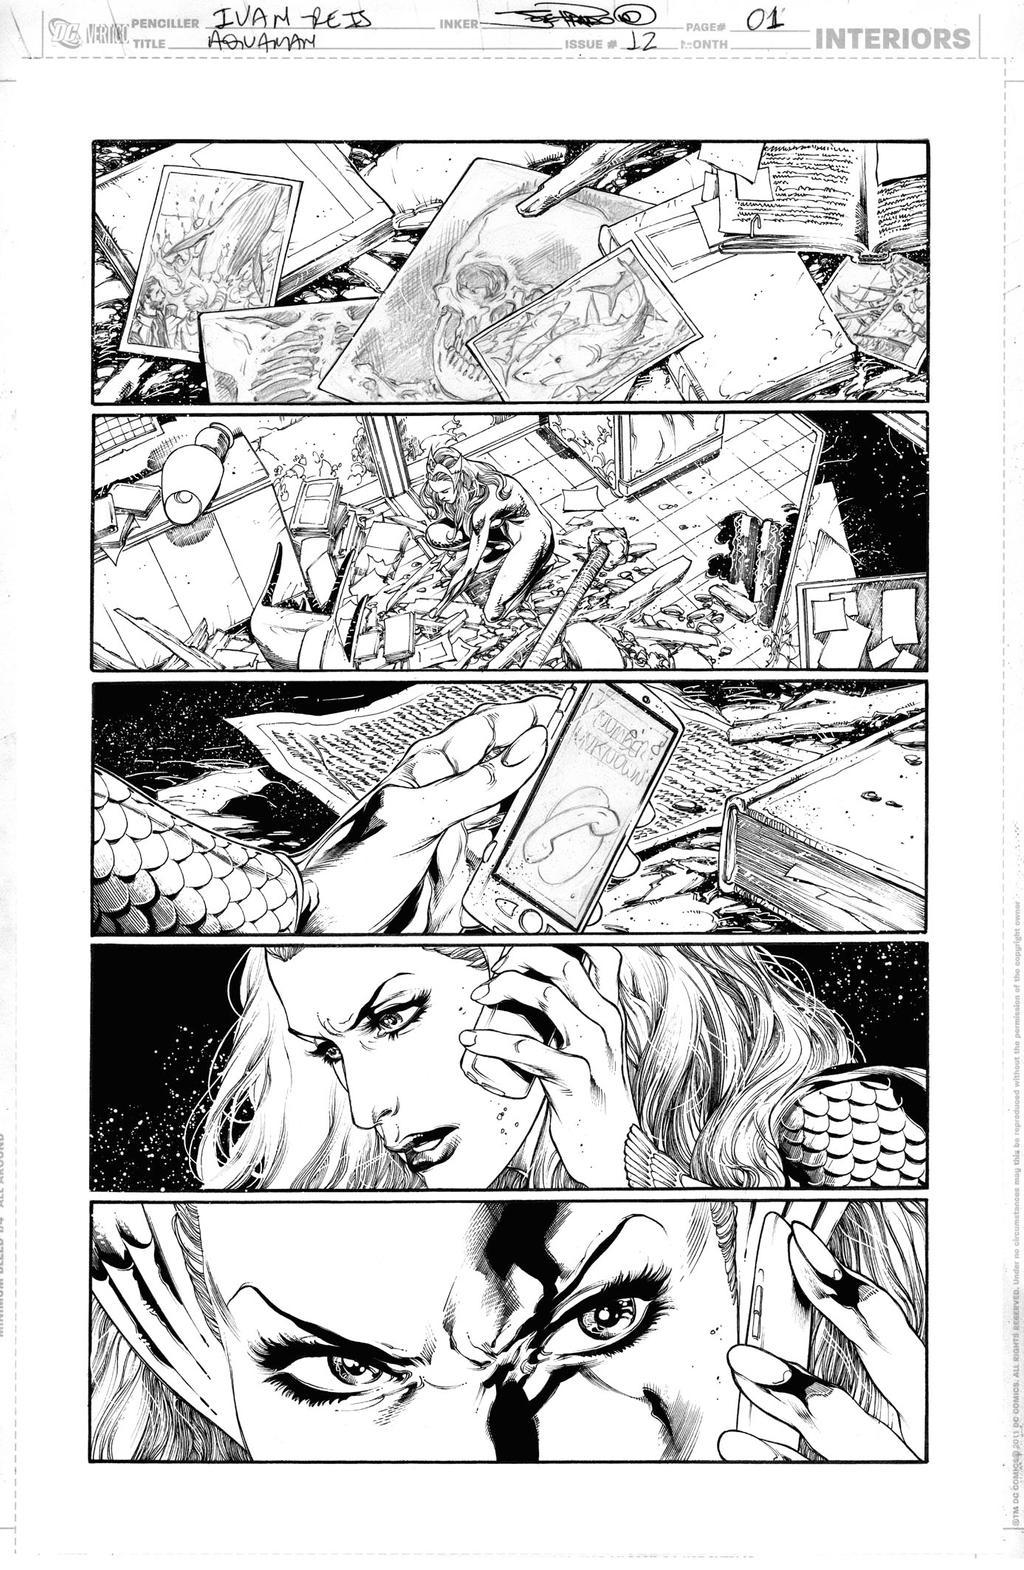 AQUAMAN Issue 12 Page 01 by JoePrado2010